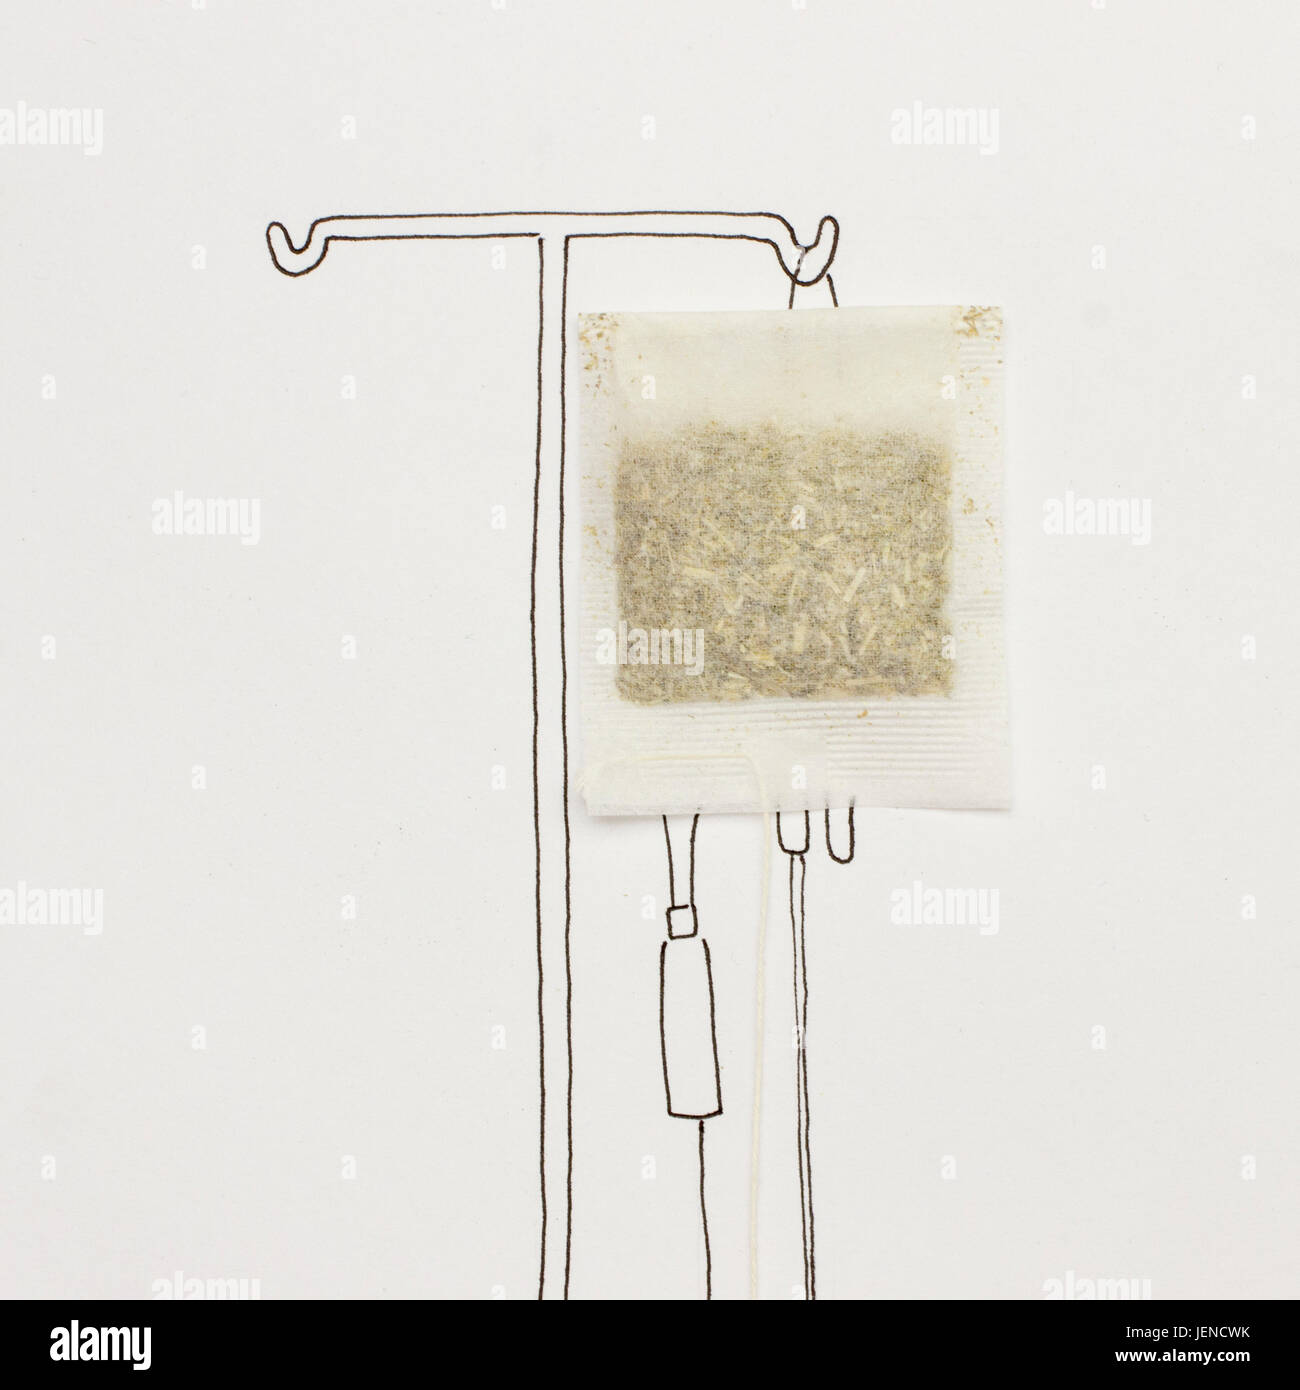 Conceptual IV transfusion drip - Stock Image